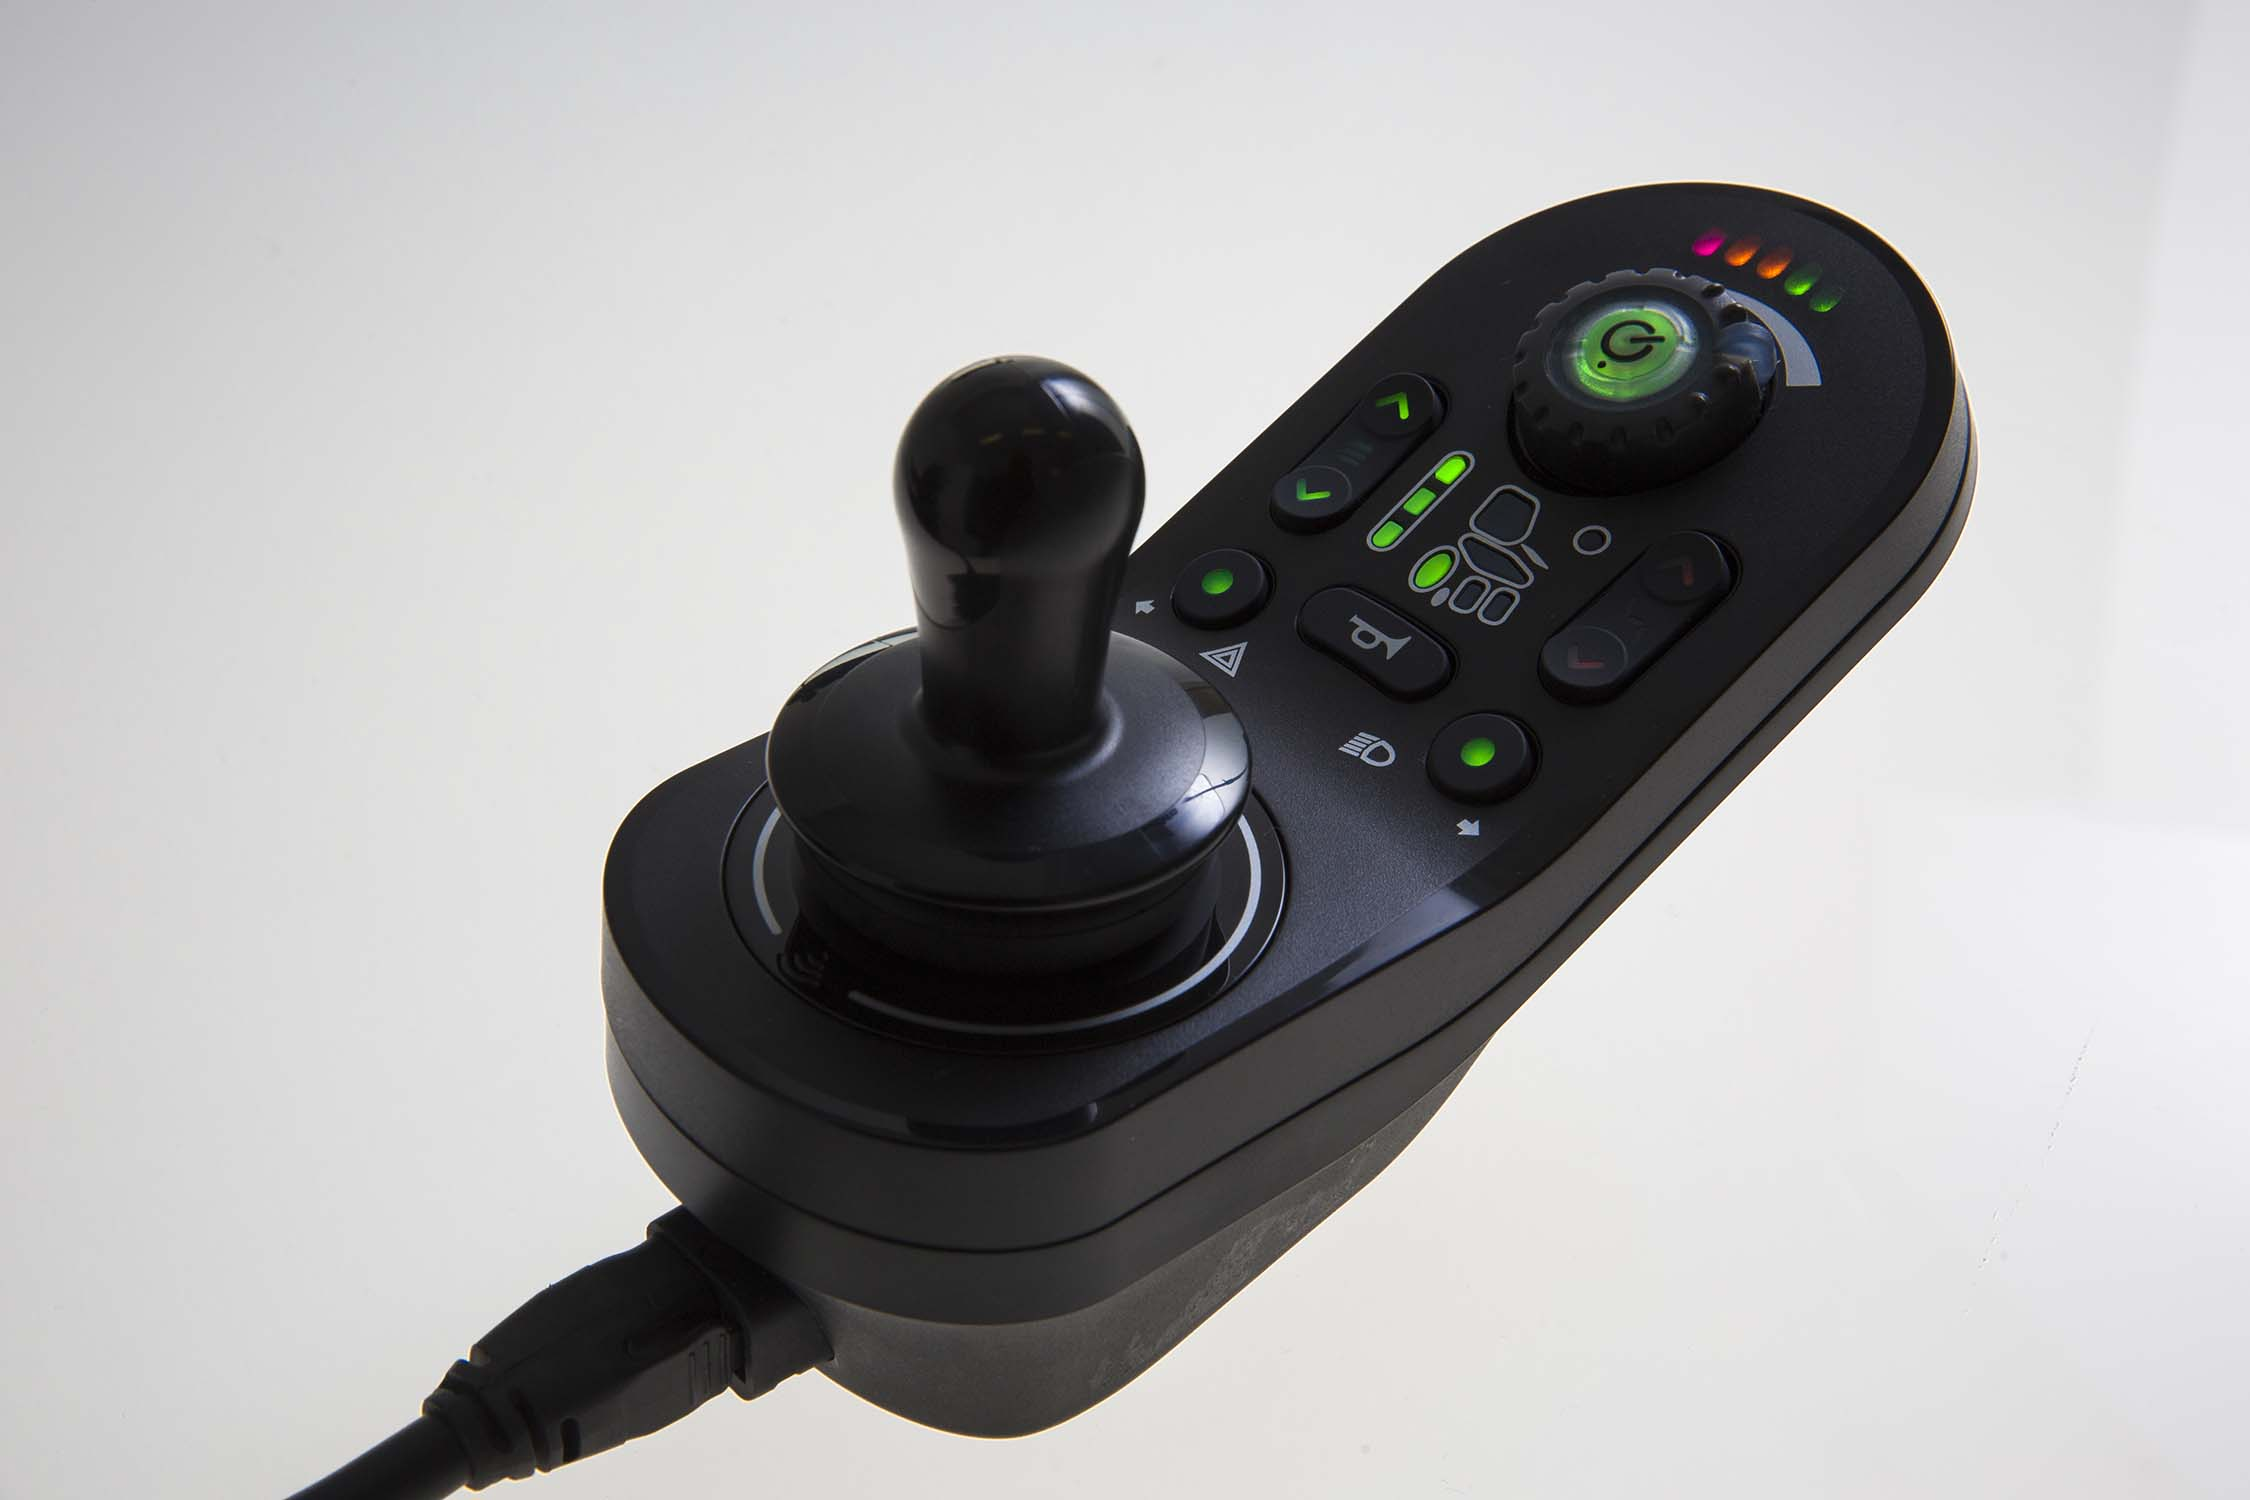 comando-linx-tecnologia-cadeira-de-rodas-3